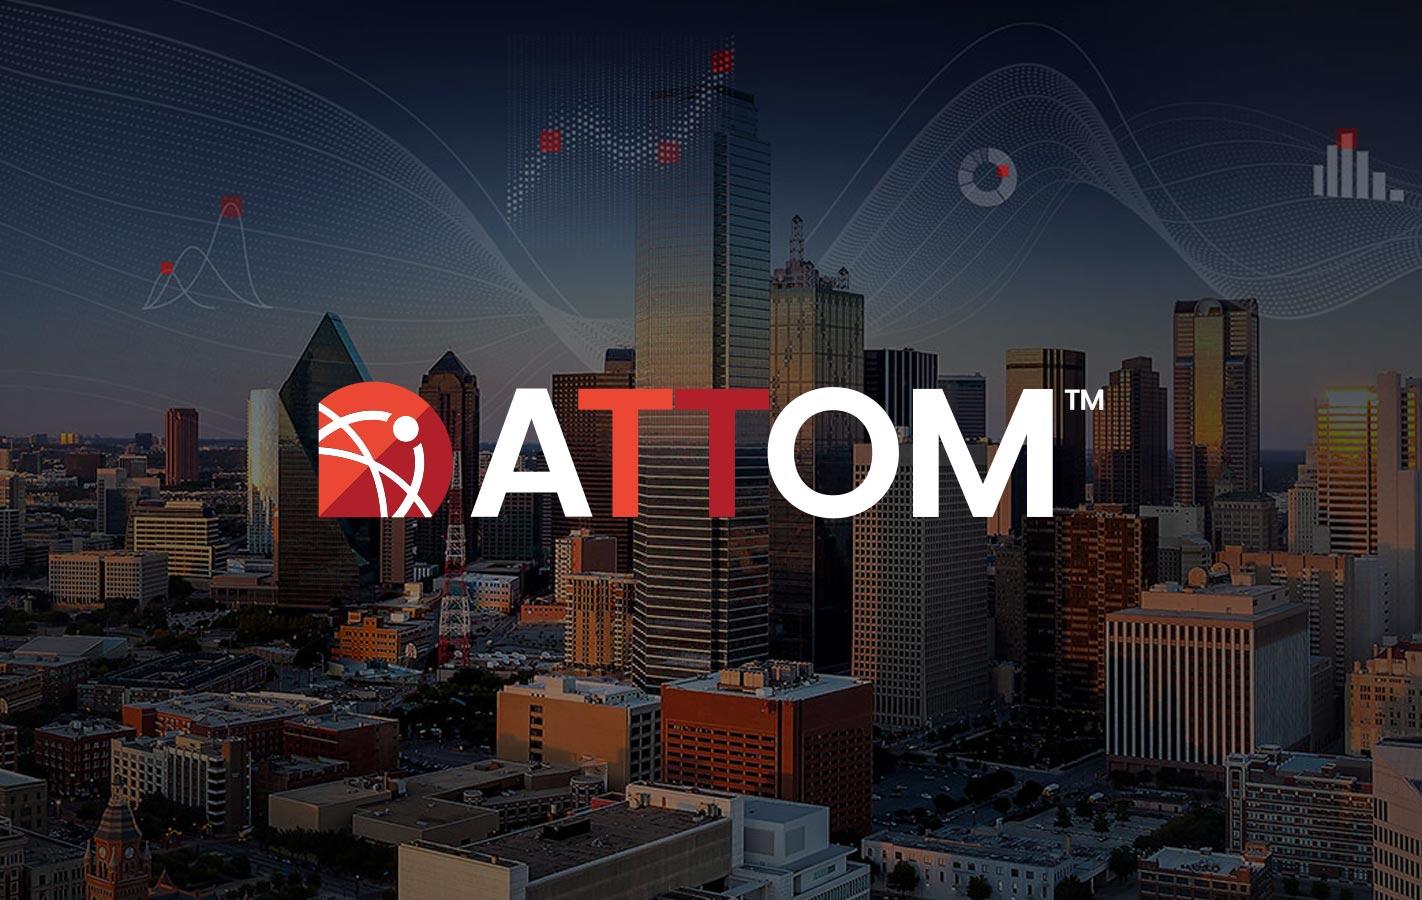 Attom data